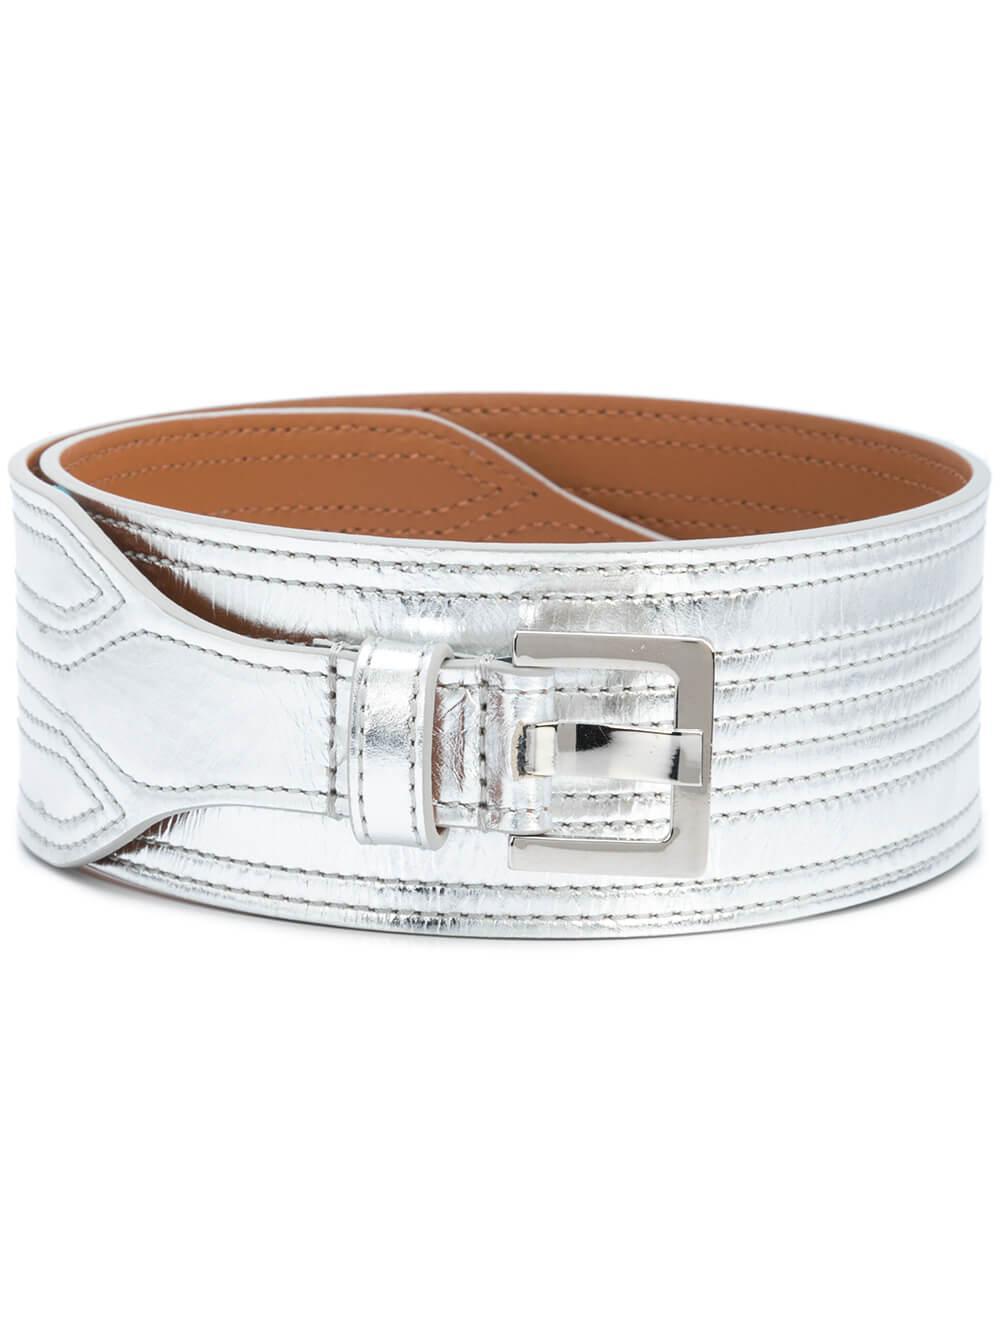 Kiara Belt